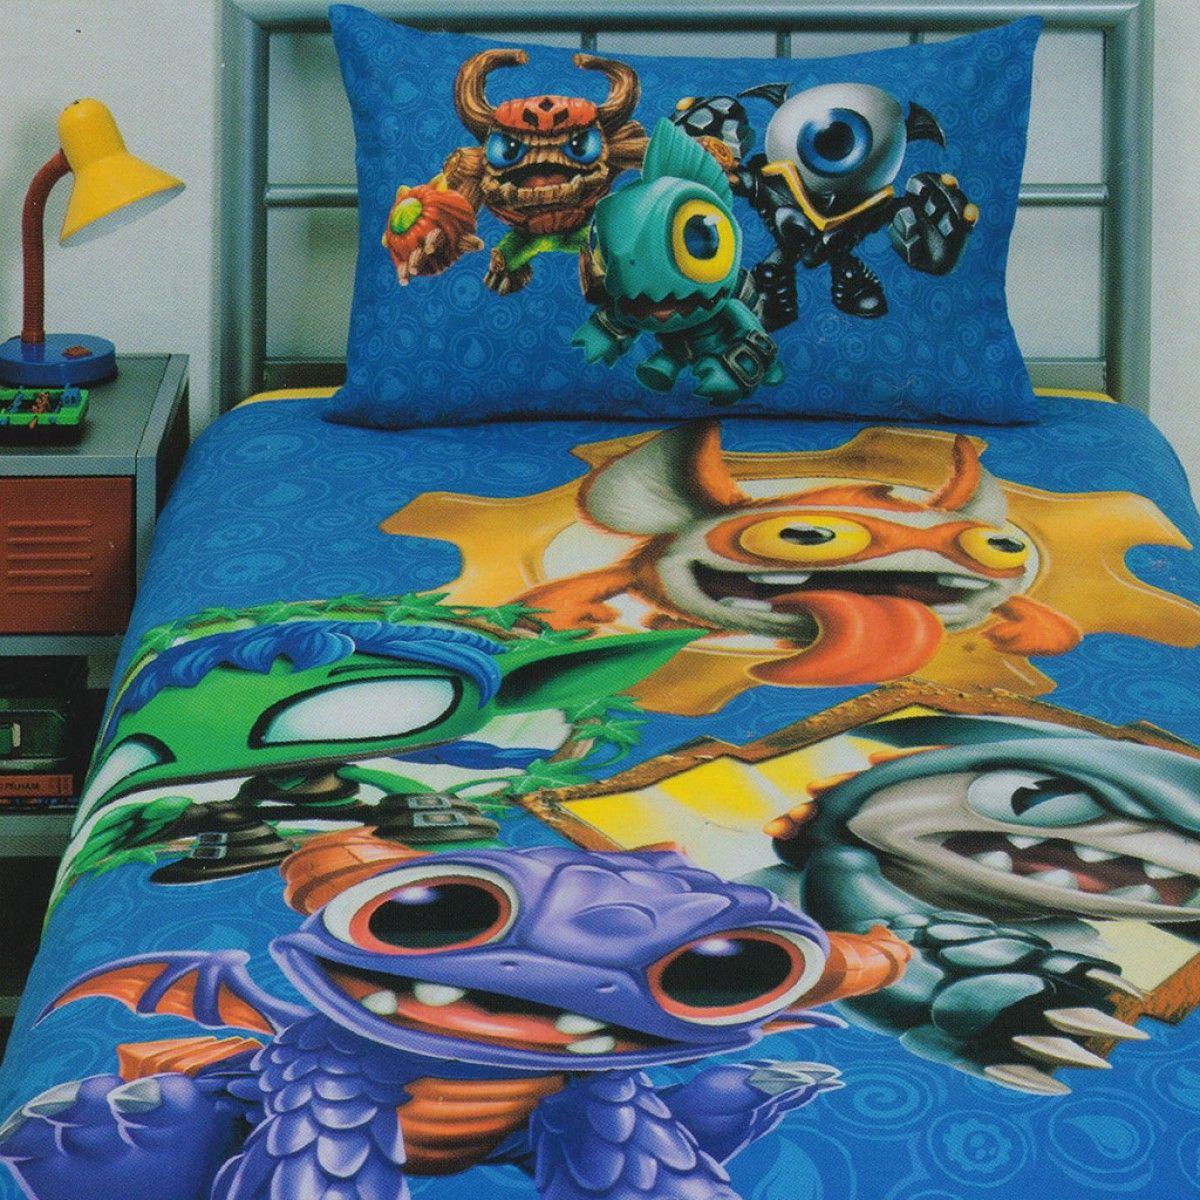 Skylanders Quilt Cover Set Quilt Cover Sets Quilt Cover Kids